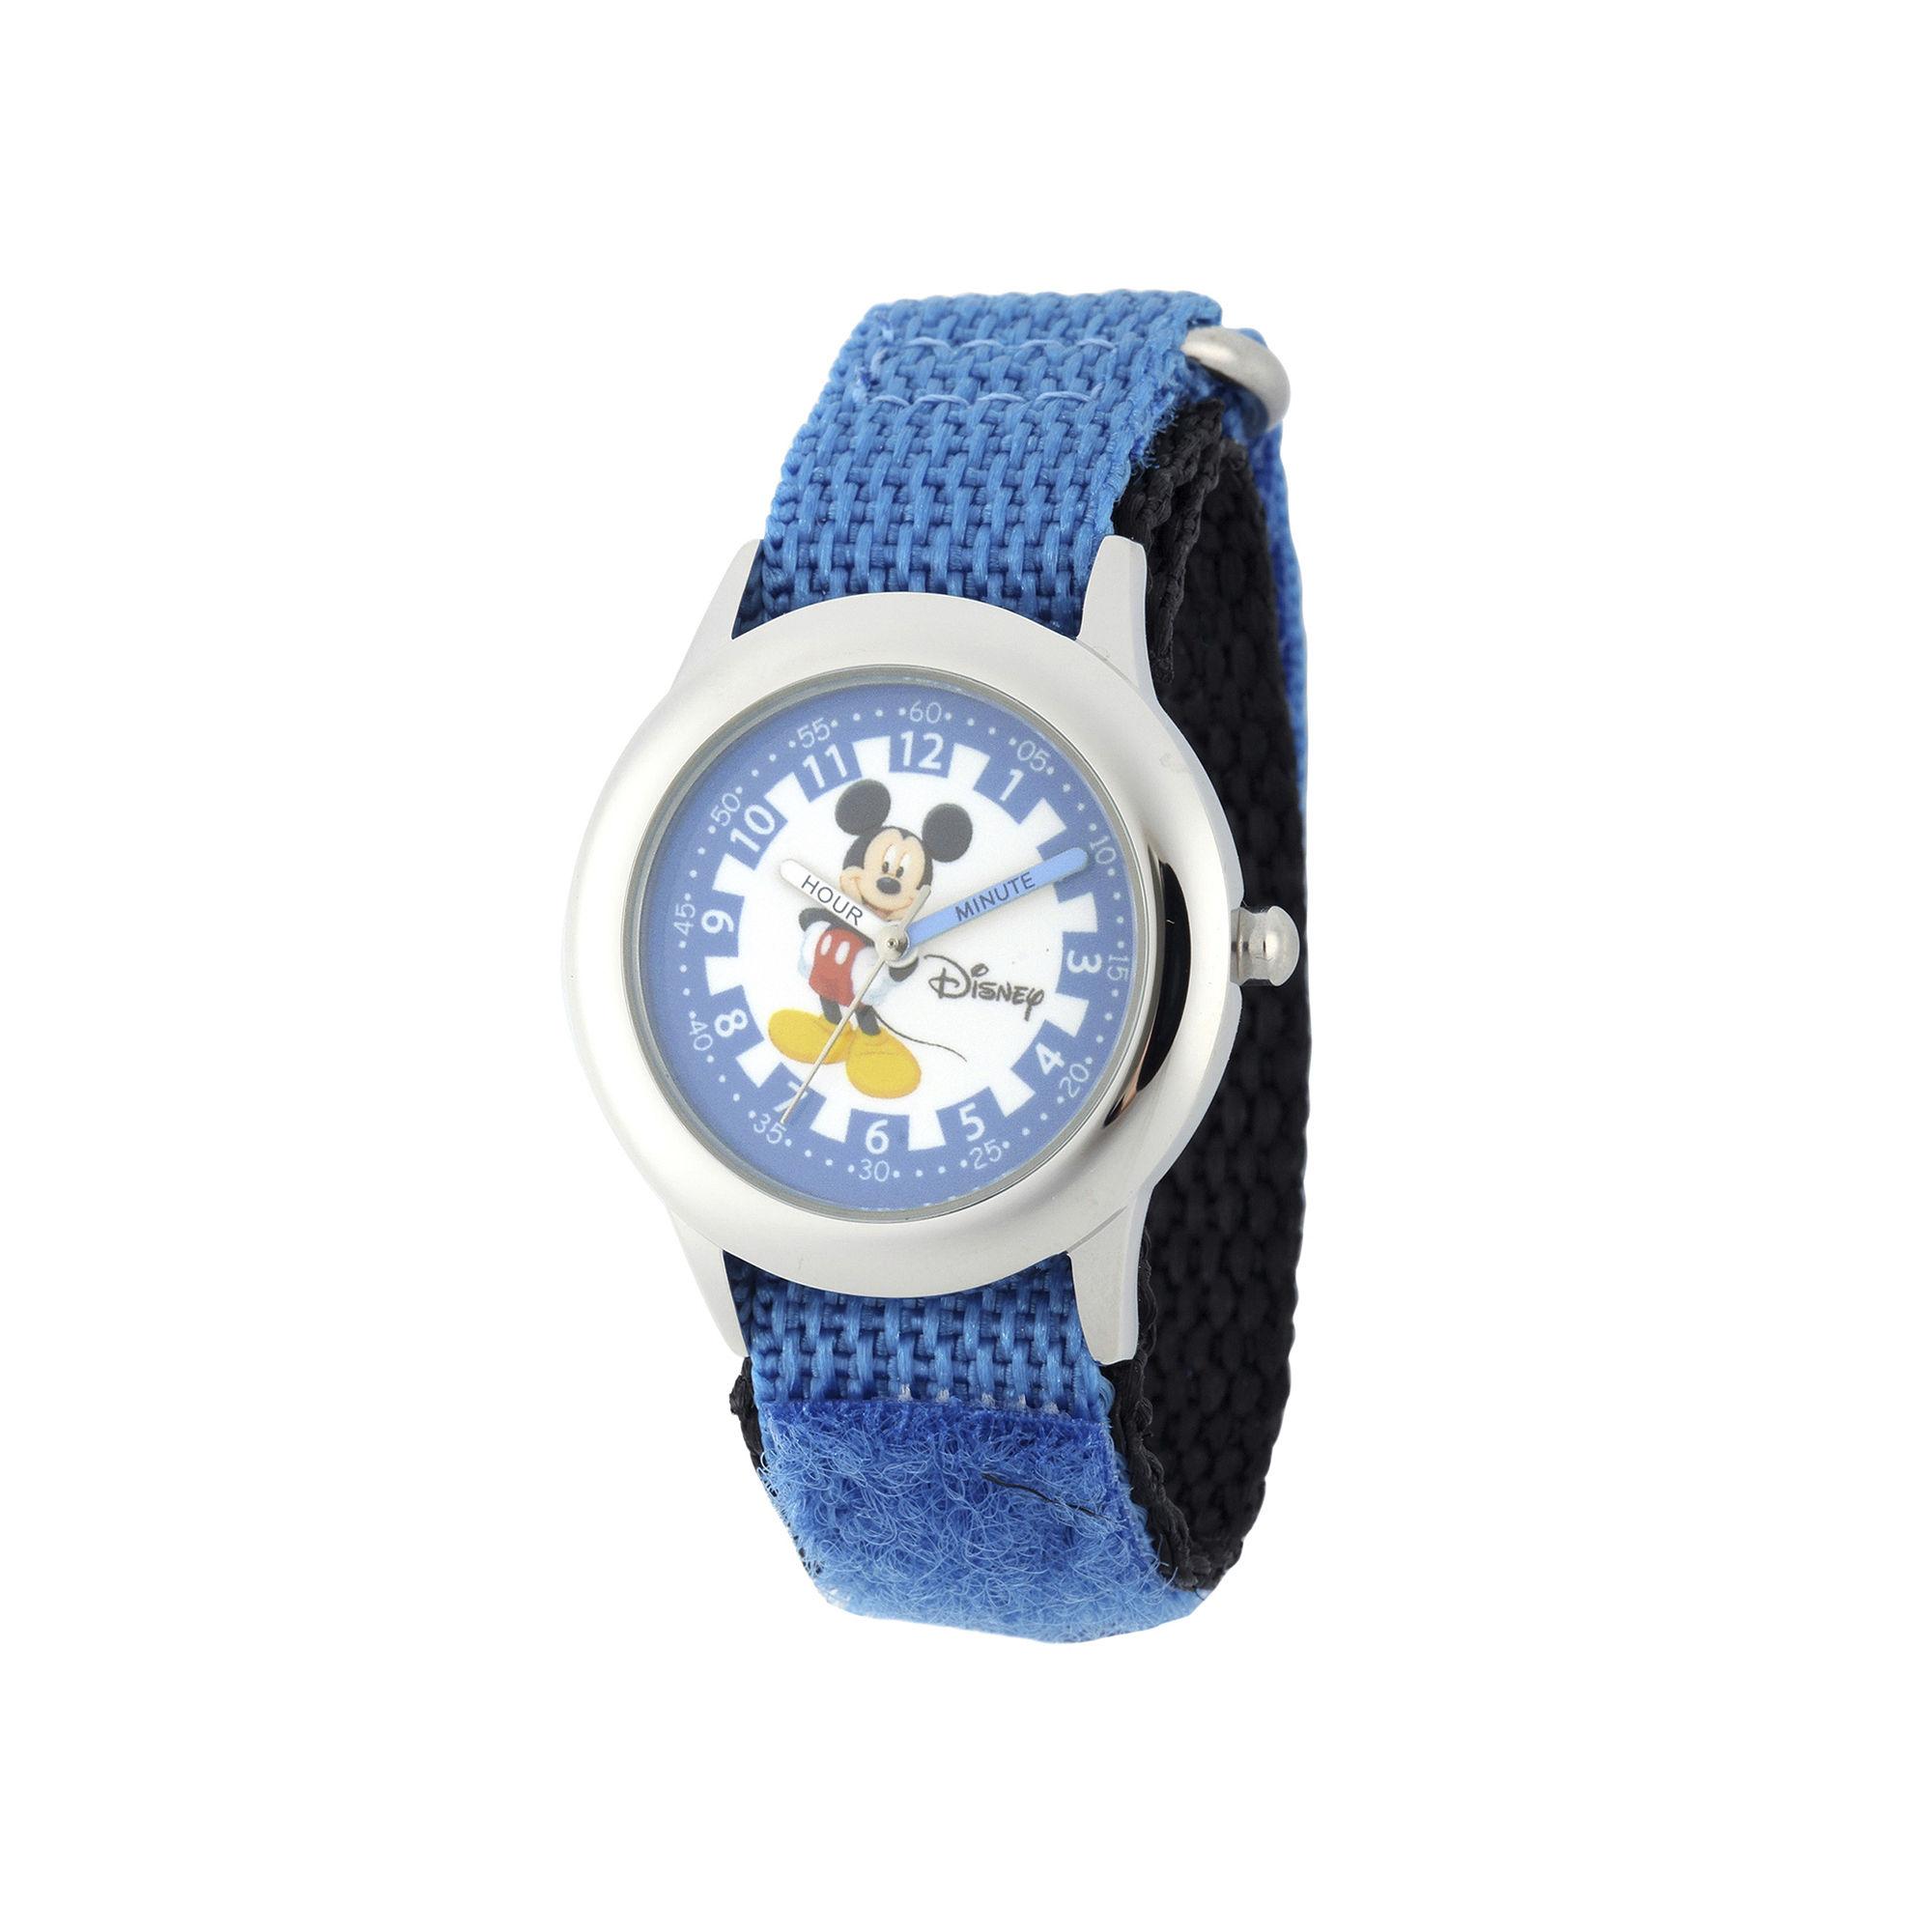 Disney Mickey Mouse Boys Blue Strap Watch